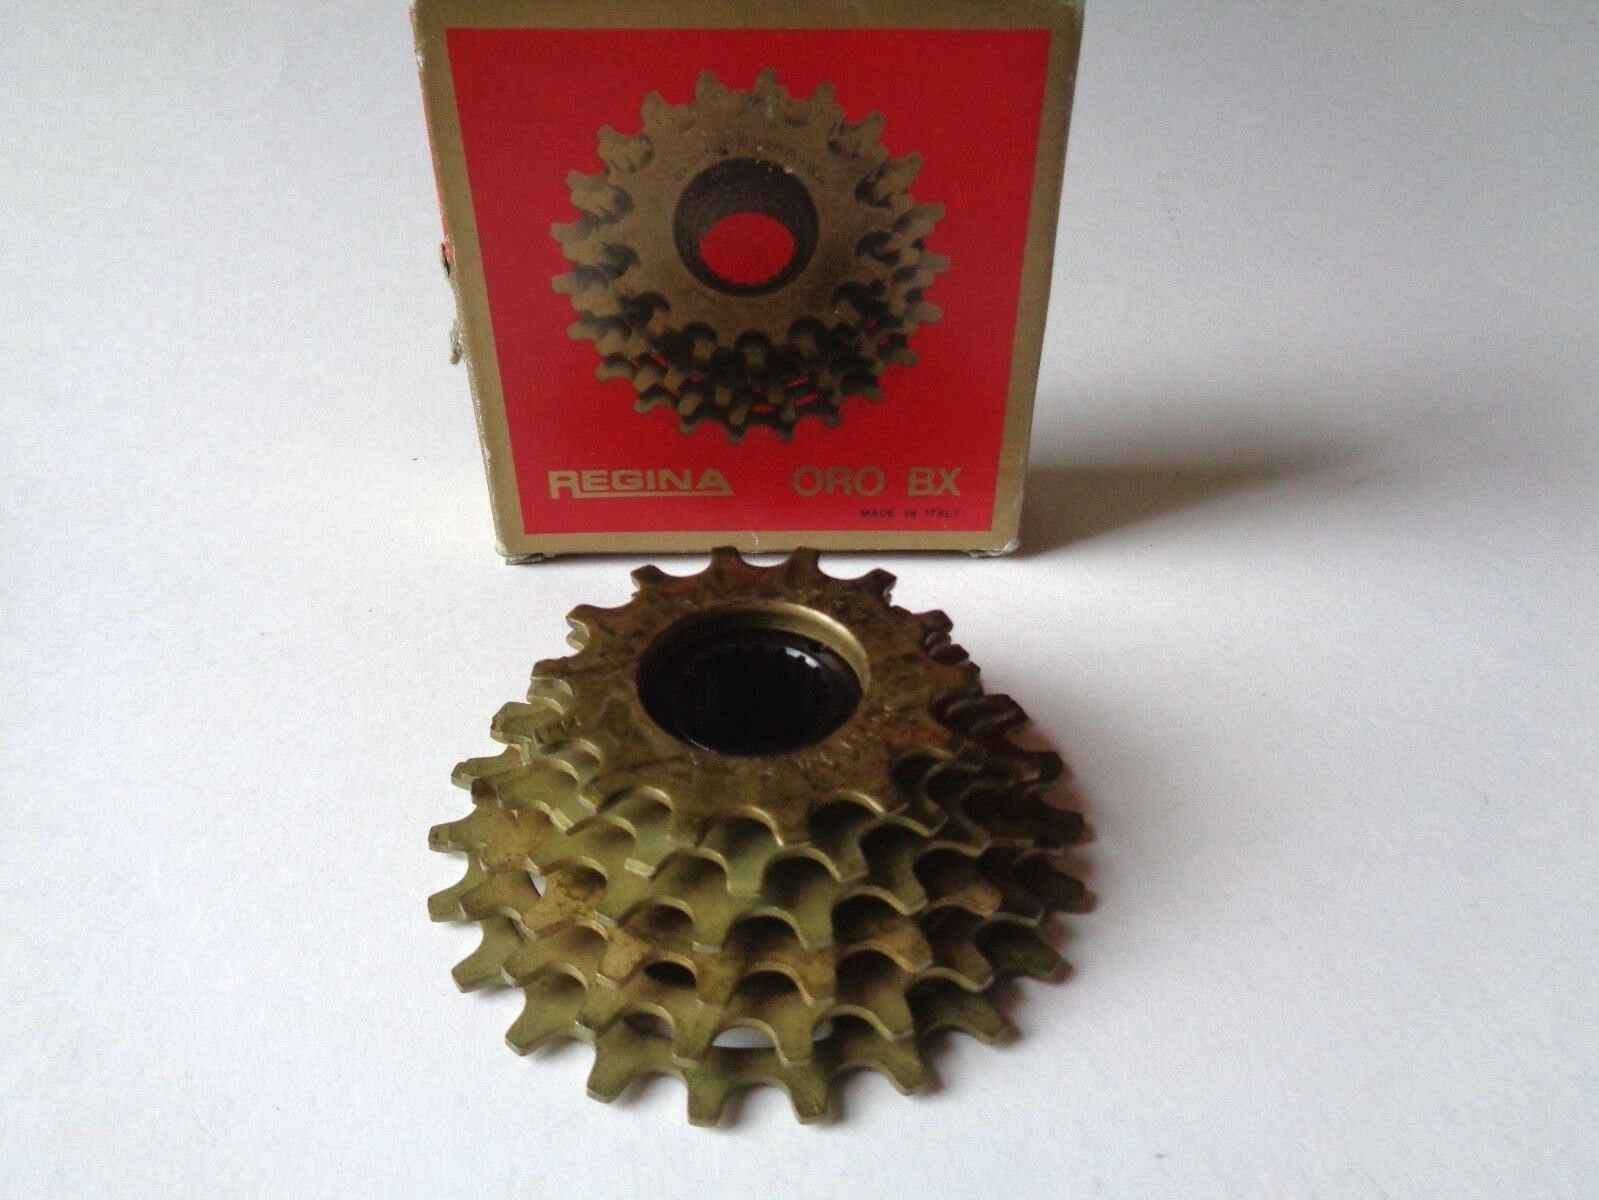 NOS Vintage 1980s REGINA EXTRA oro BX COGS 14-23 6 Velocidades ISO cassette de rueda libre